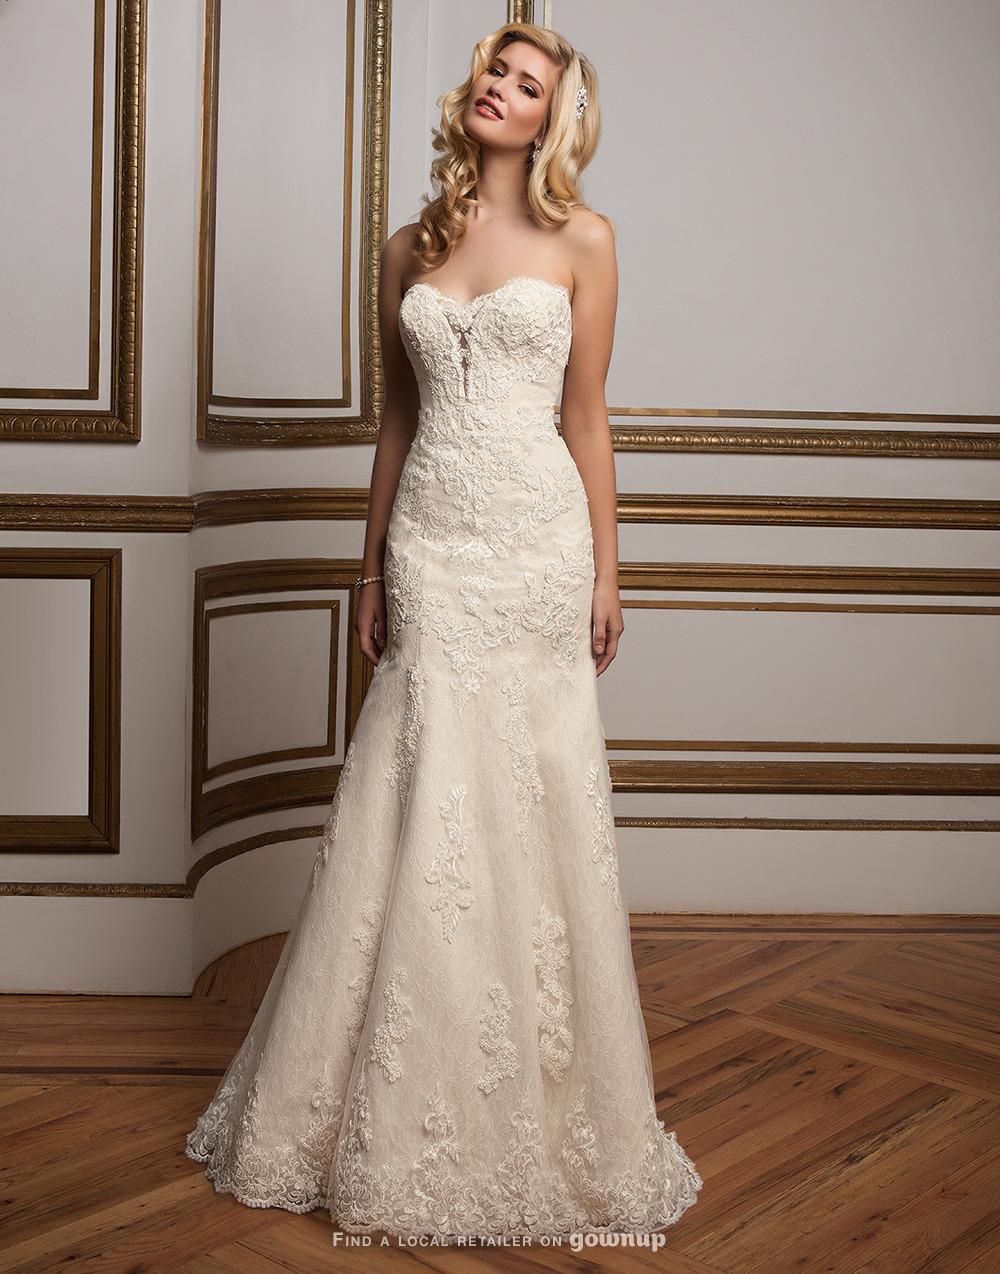 justin alexander wedding dresses prices photo - 1